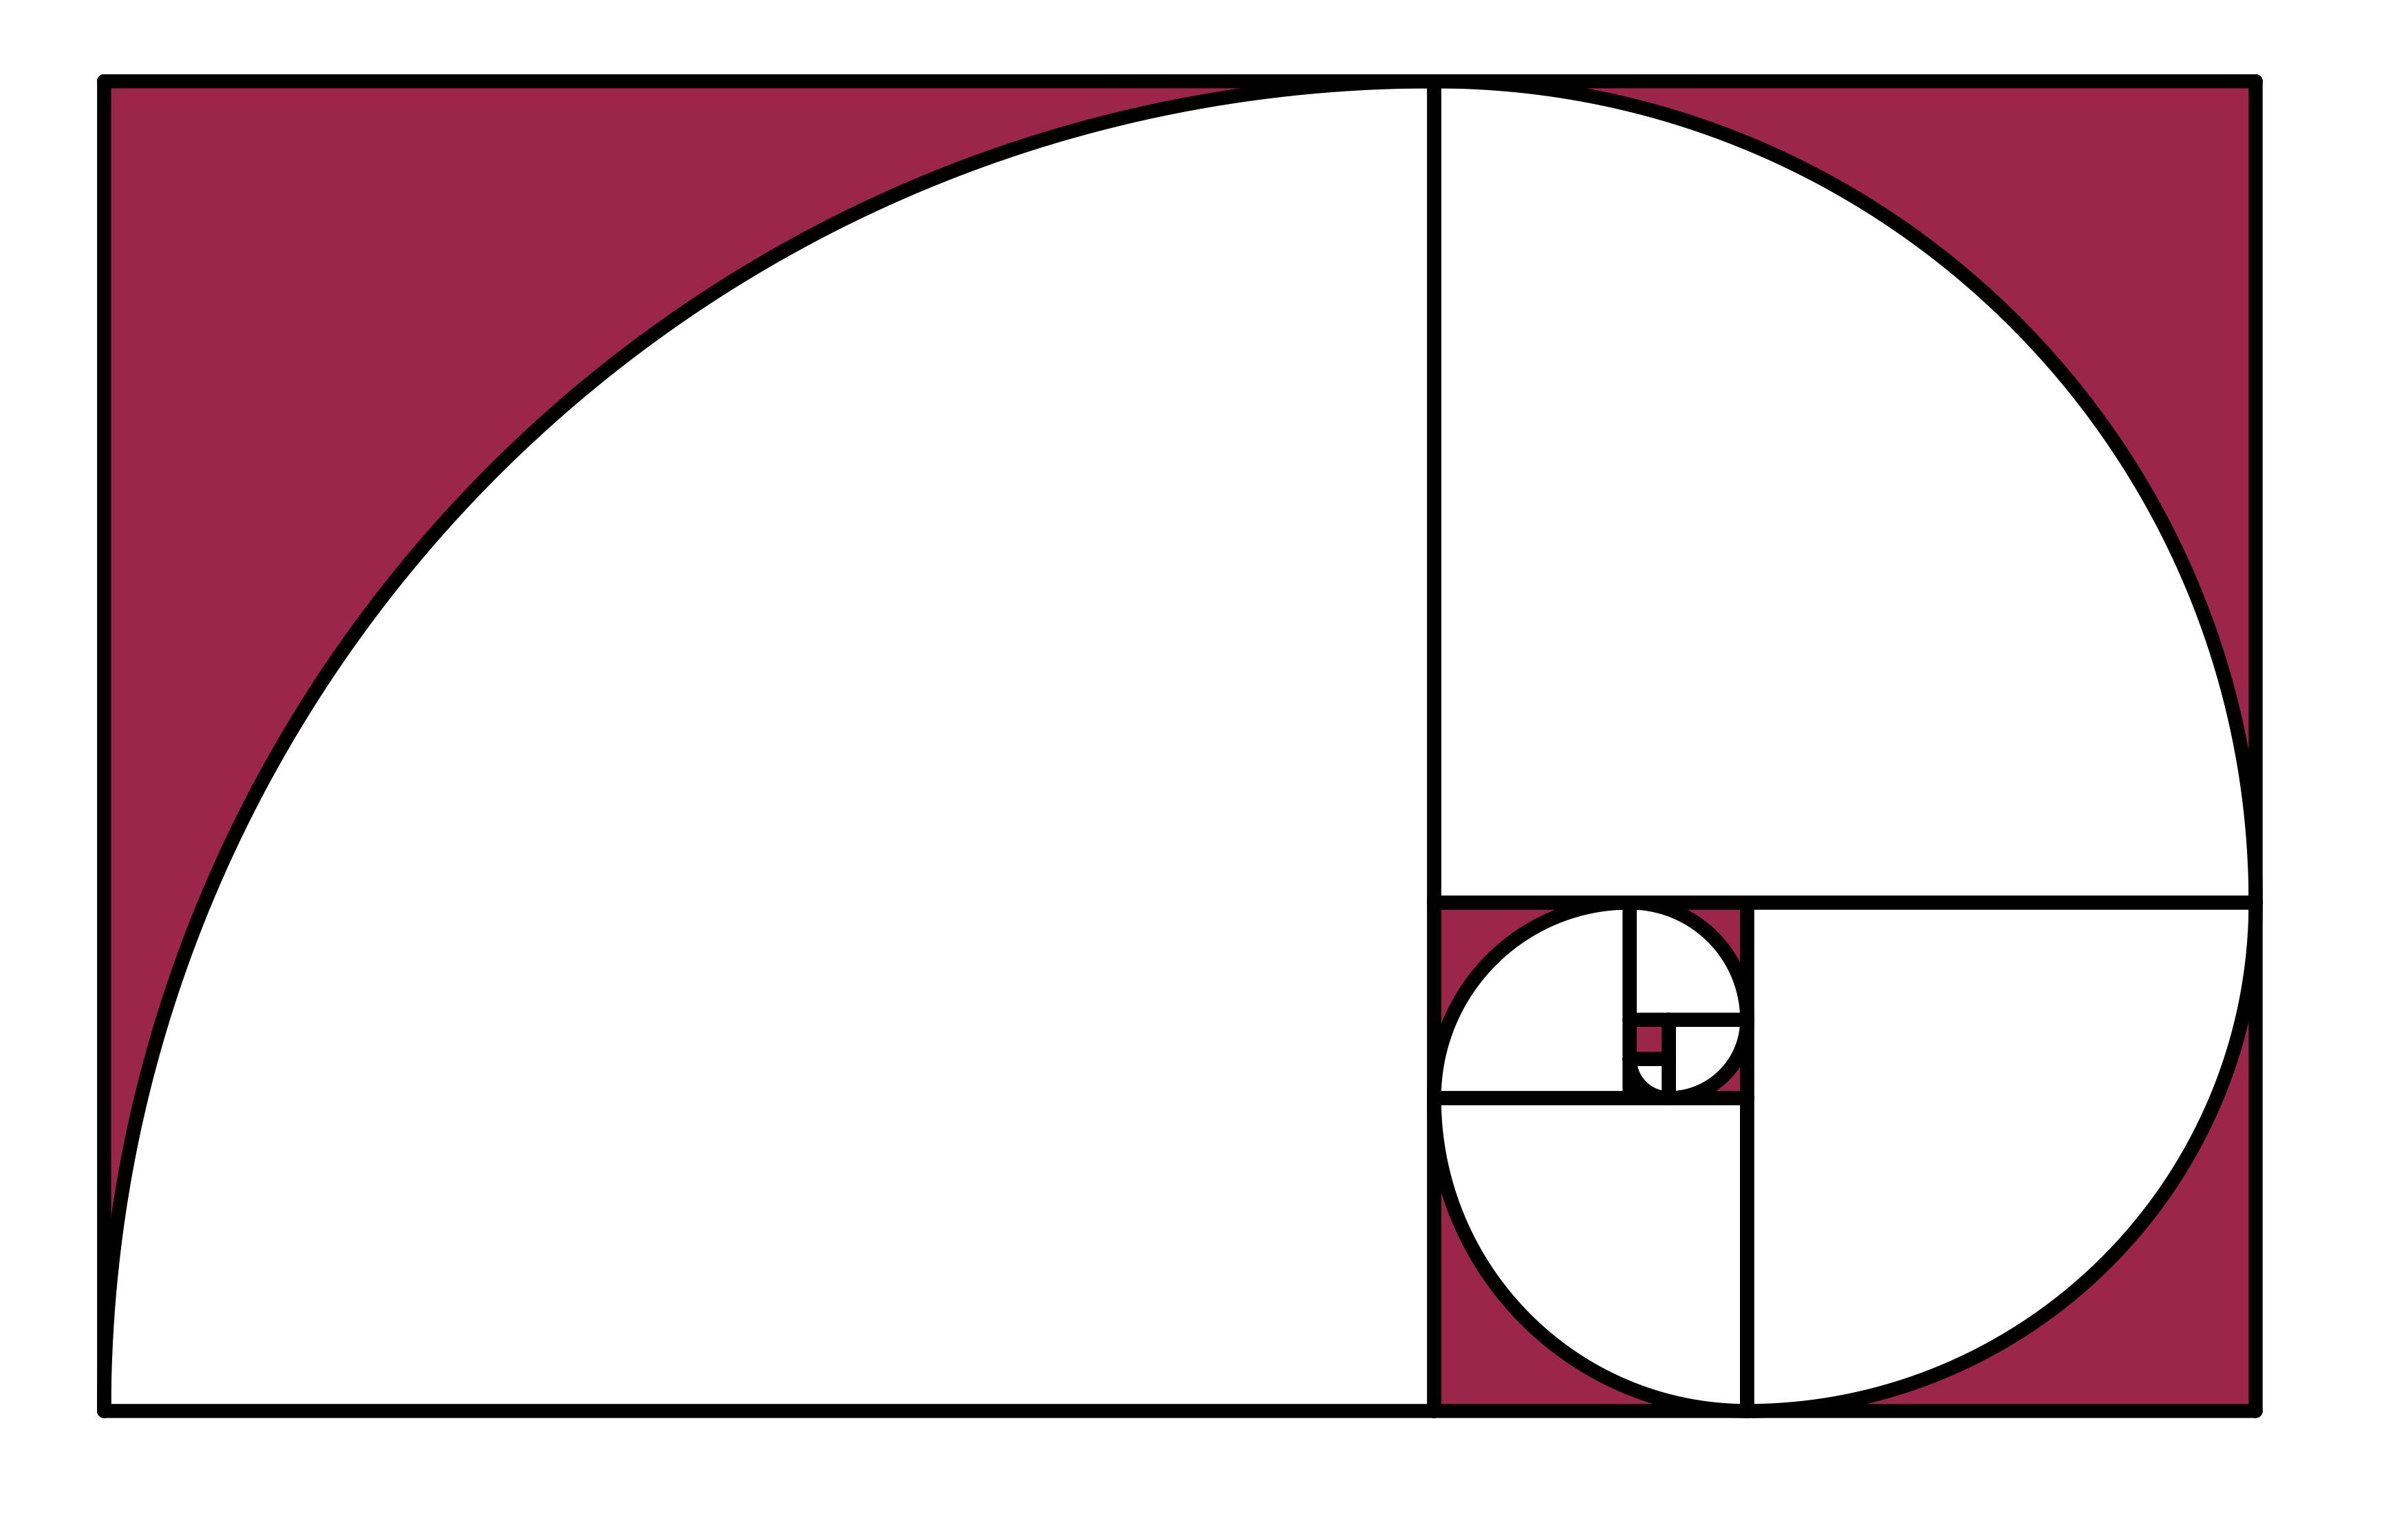 [AMC 10/12B with the Bard Math Circle]